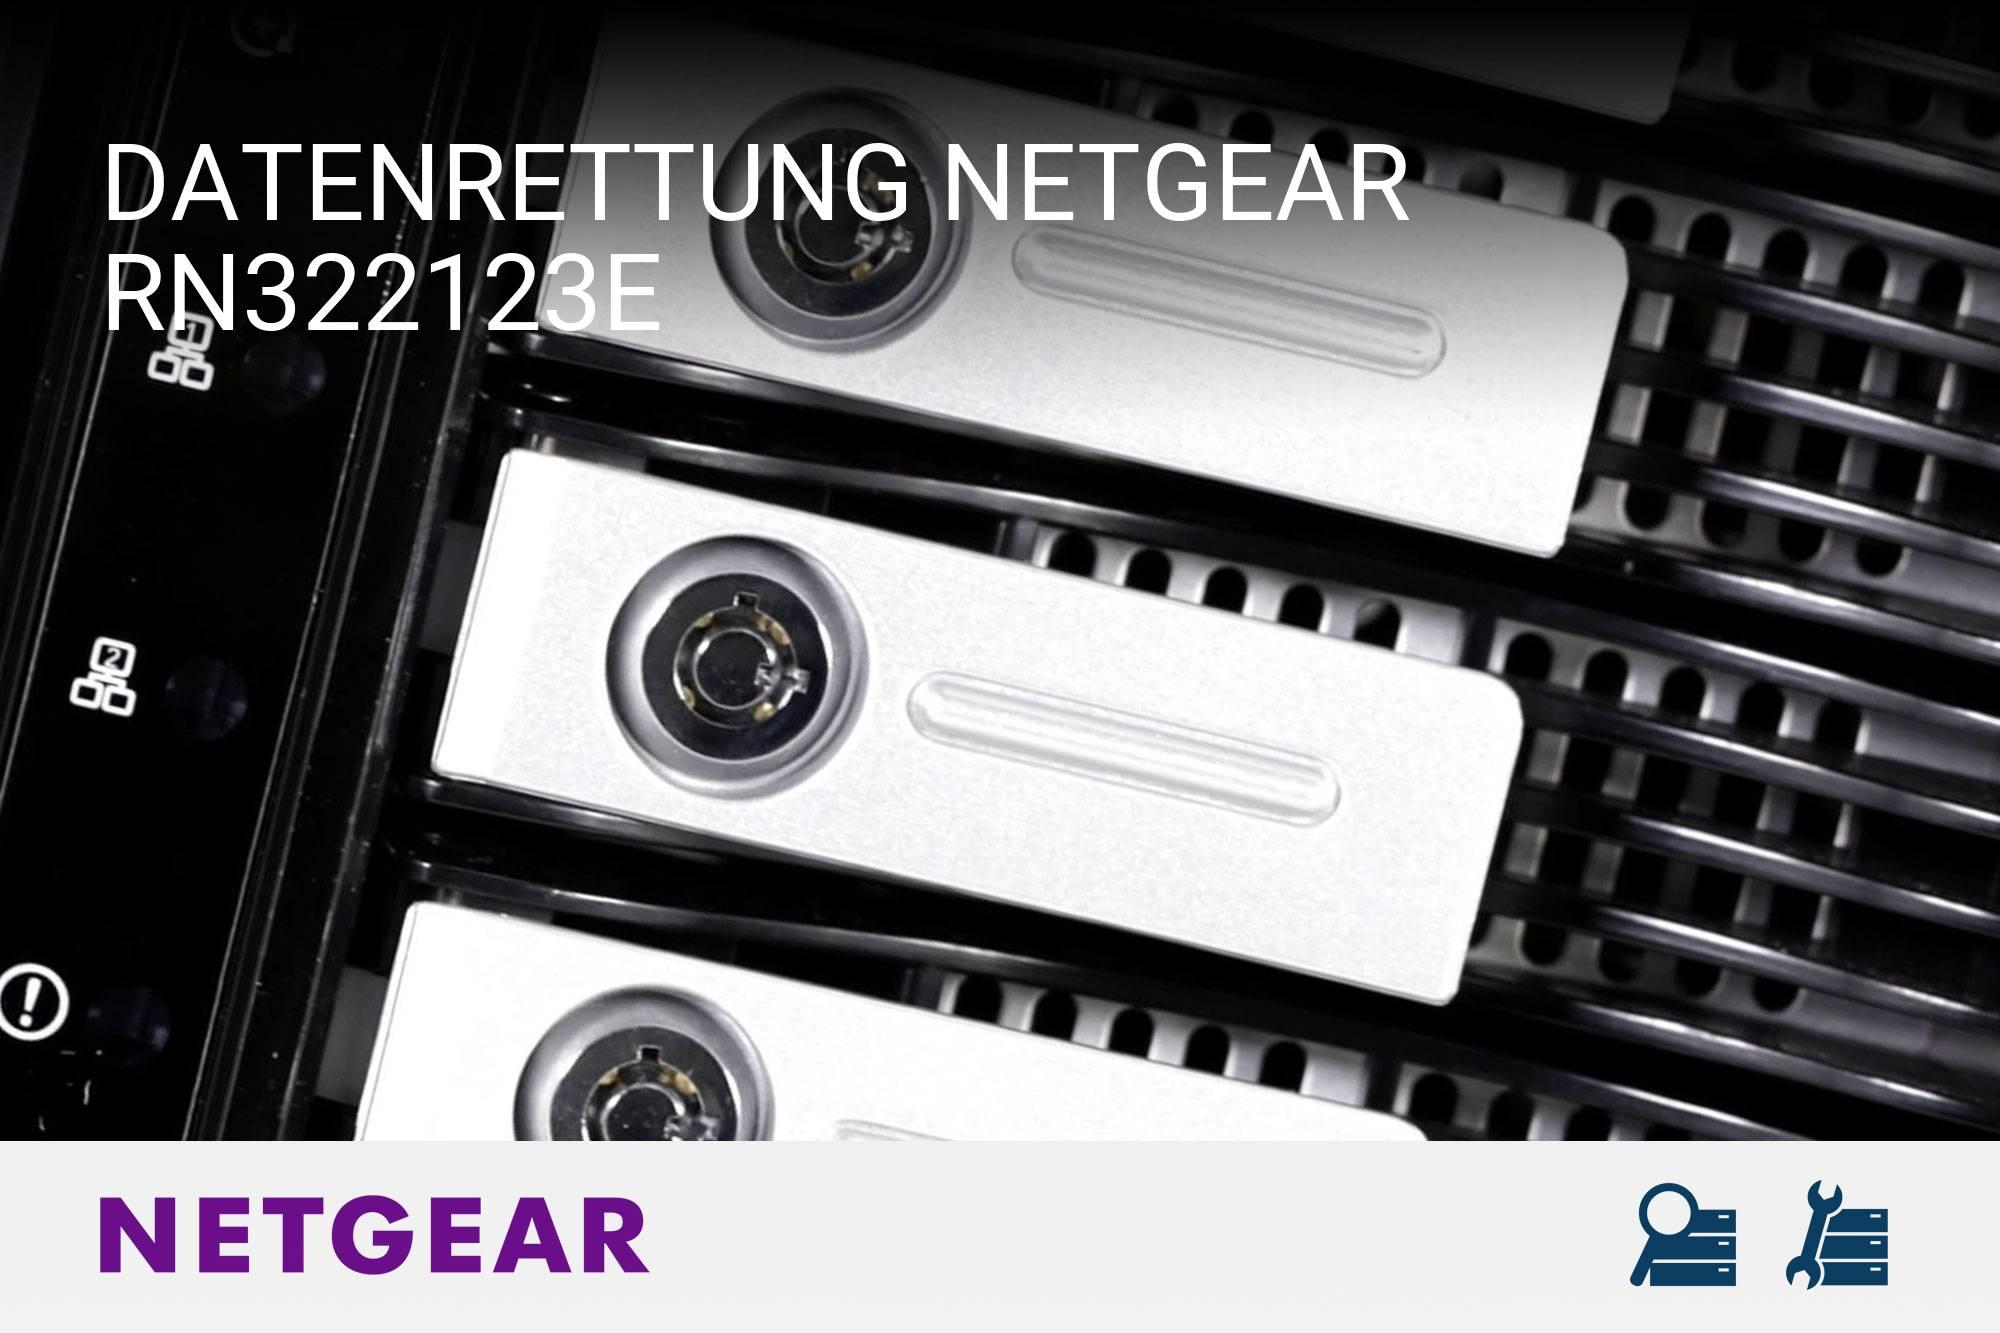 Netgear RN322123E